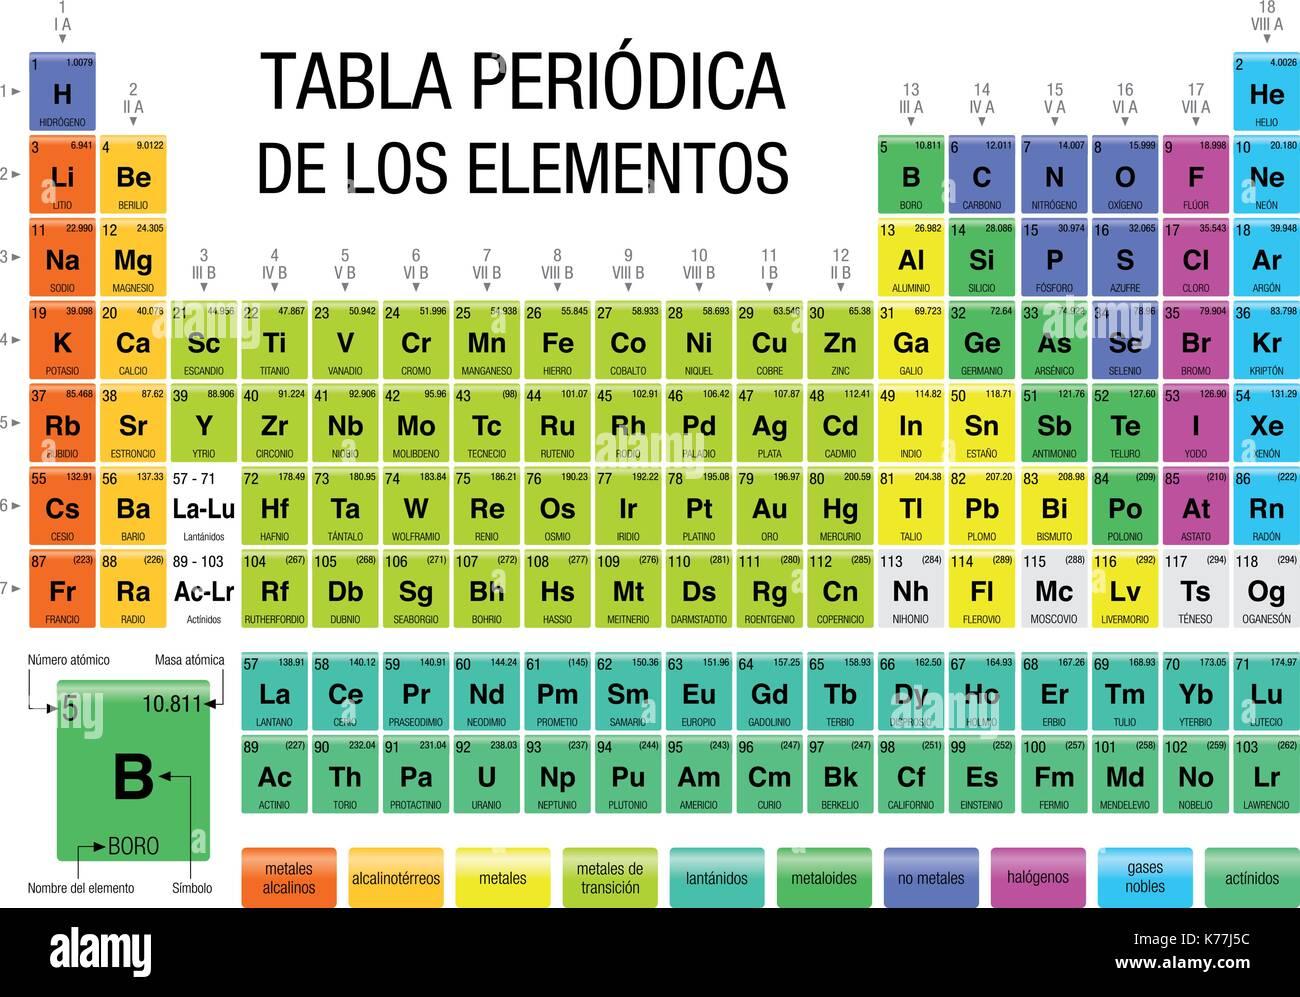 Tabla periodica de los elementos periodic table of elements in tabla periodica de los elementos periodic table of elements in spanish language with the 4 new elements included on november 28 2016 urtaz Gallery